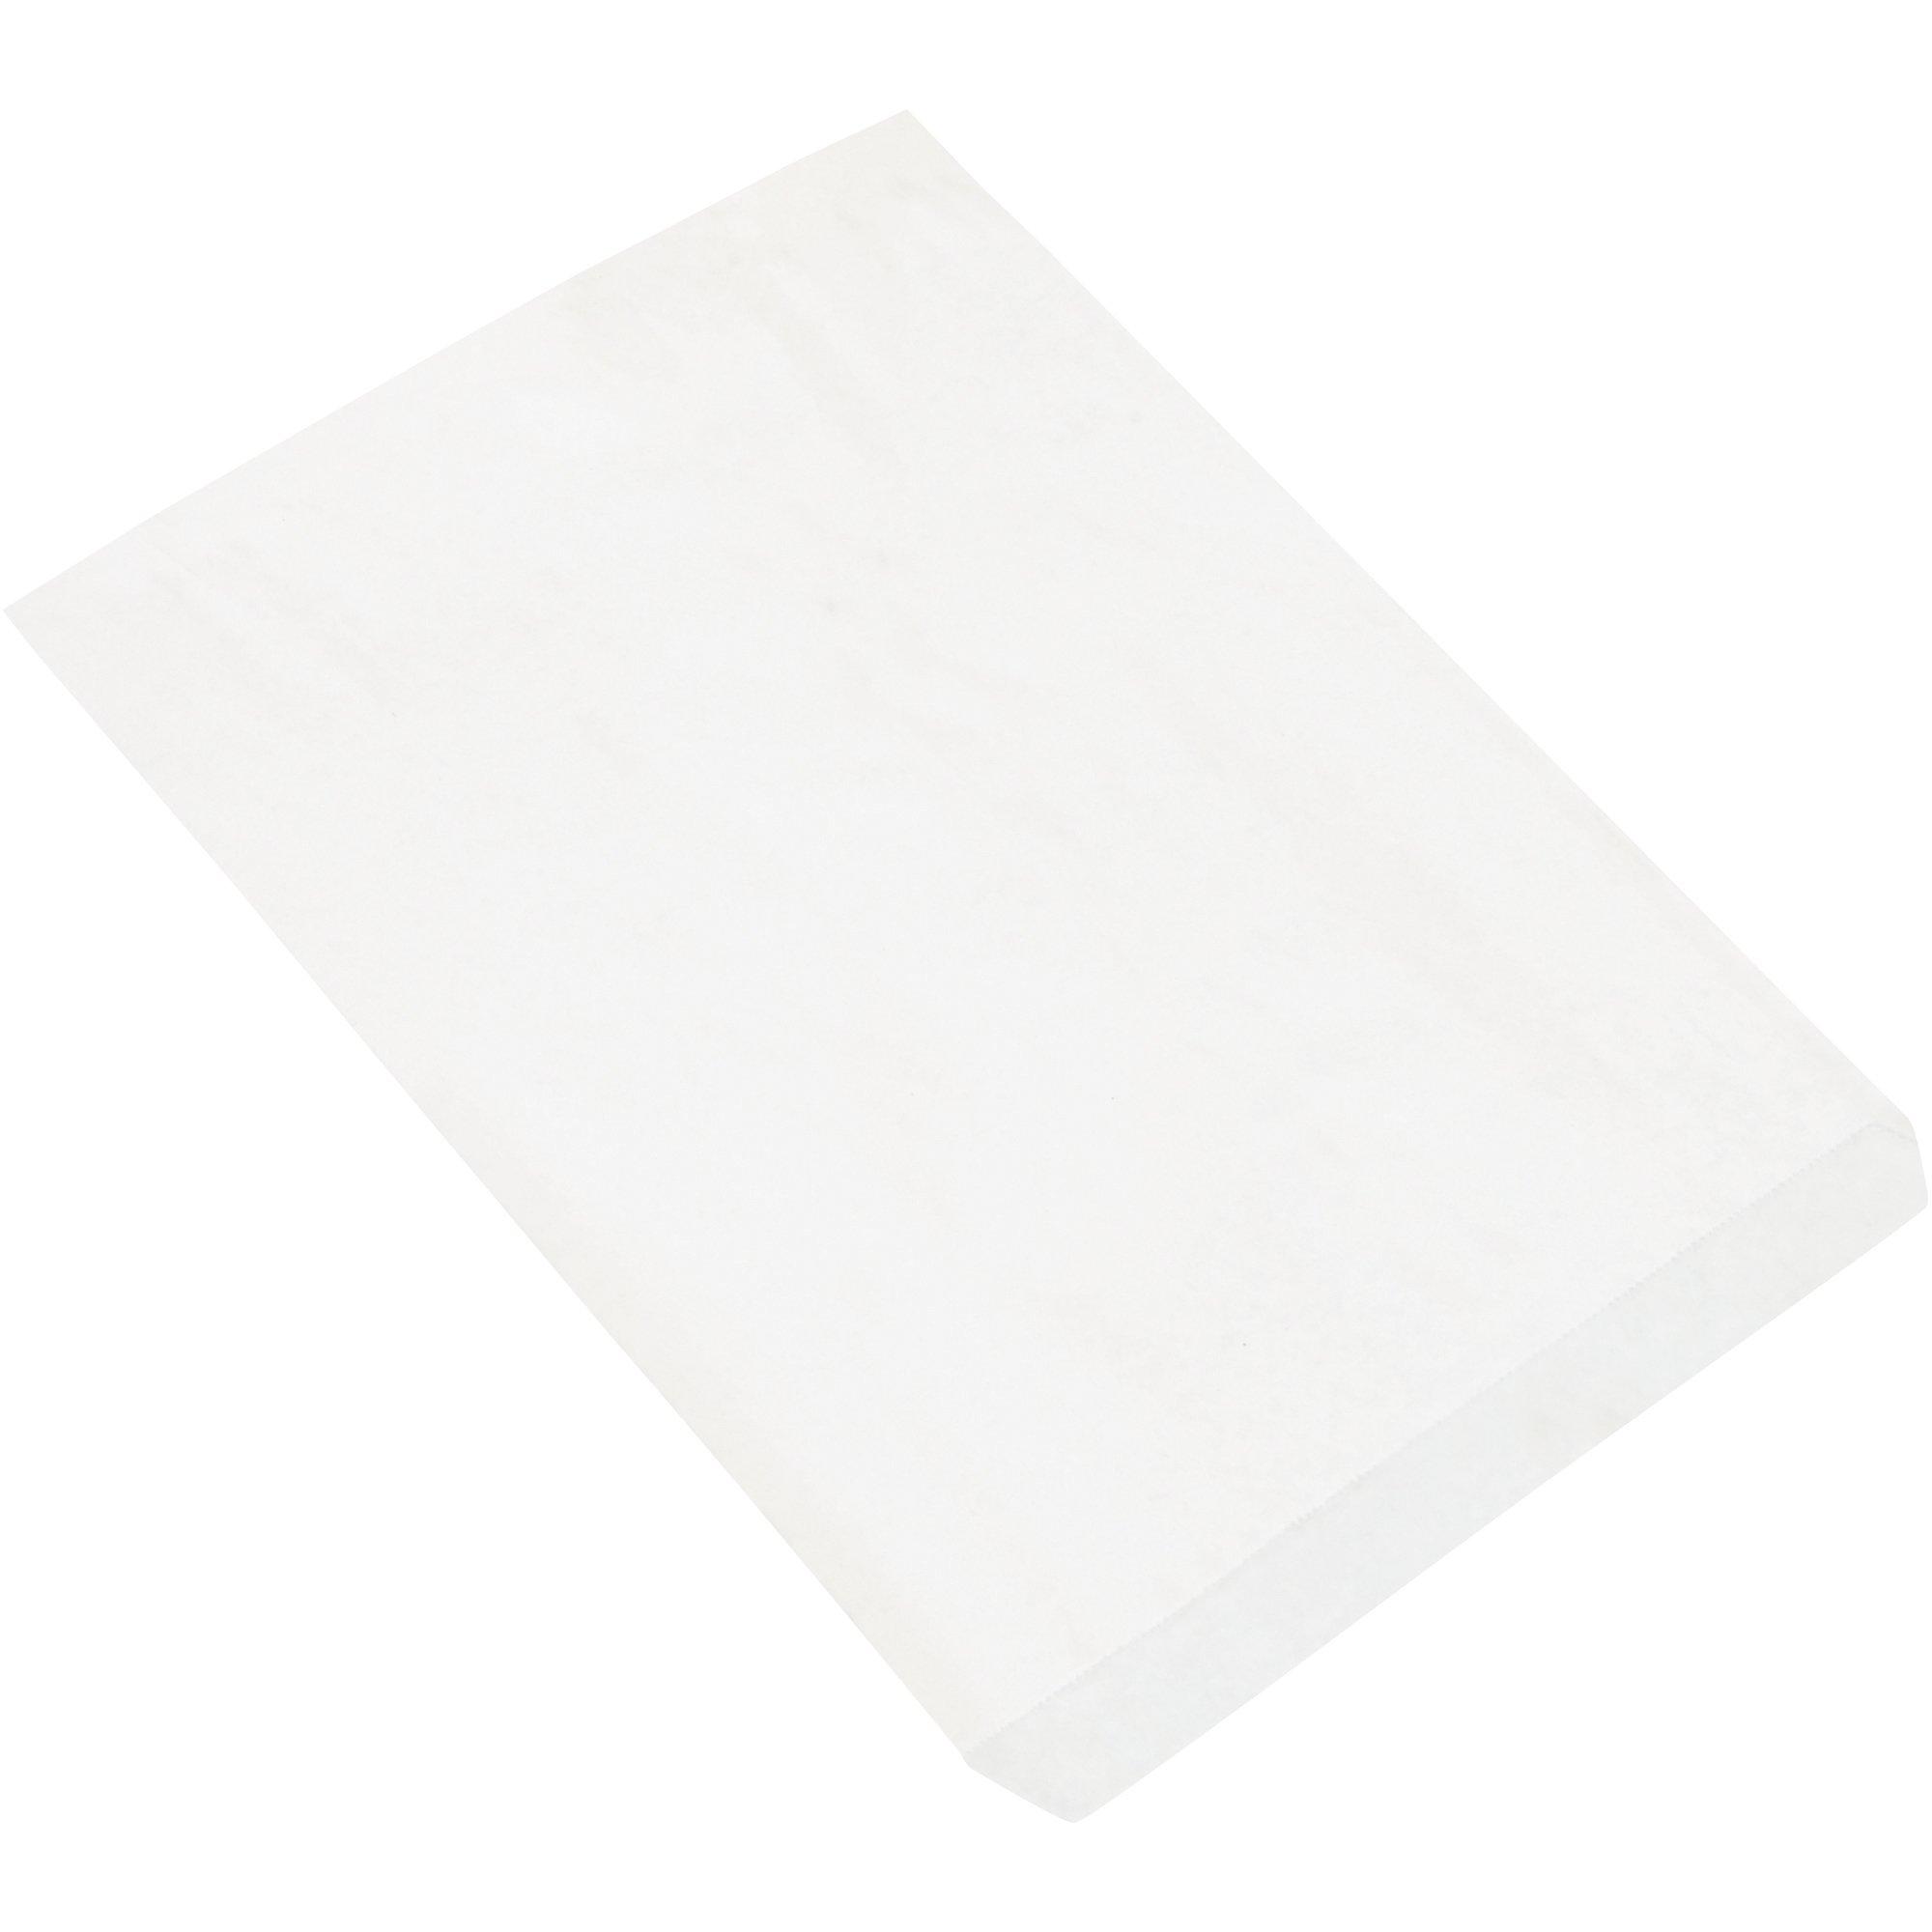 Flat Merchandise Bags, 10'' x 13'', White, 1000/Case